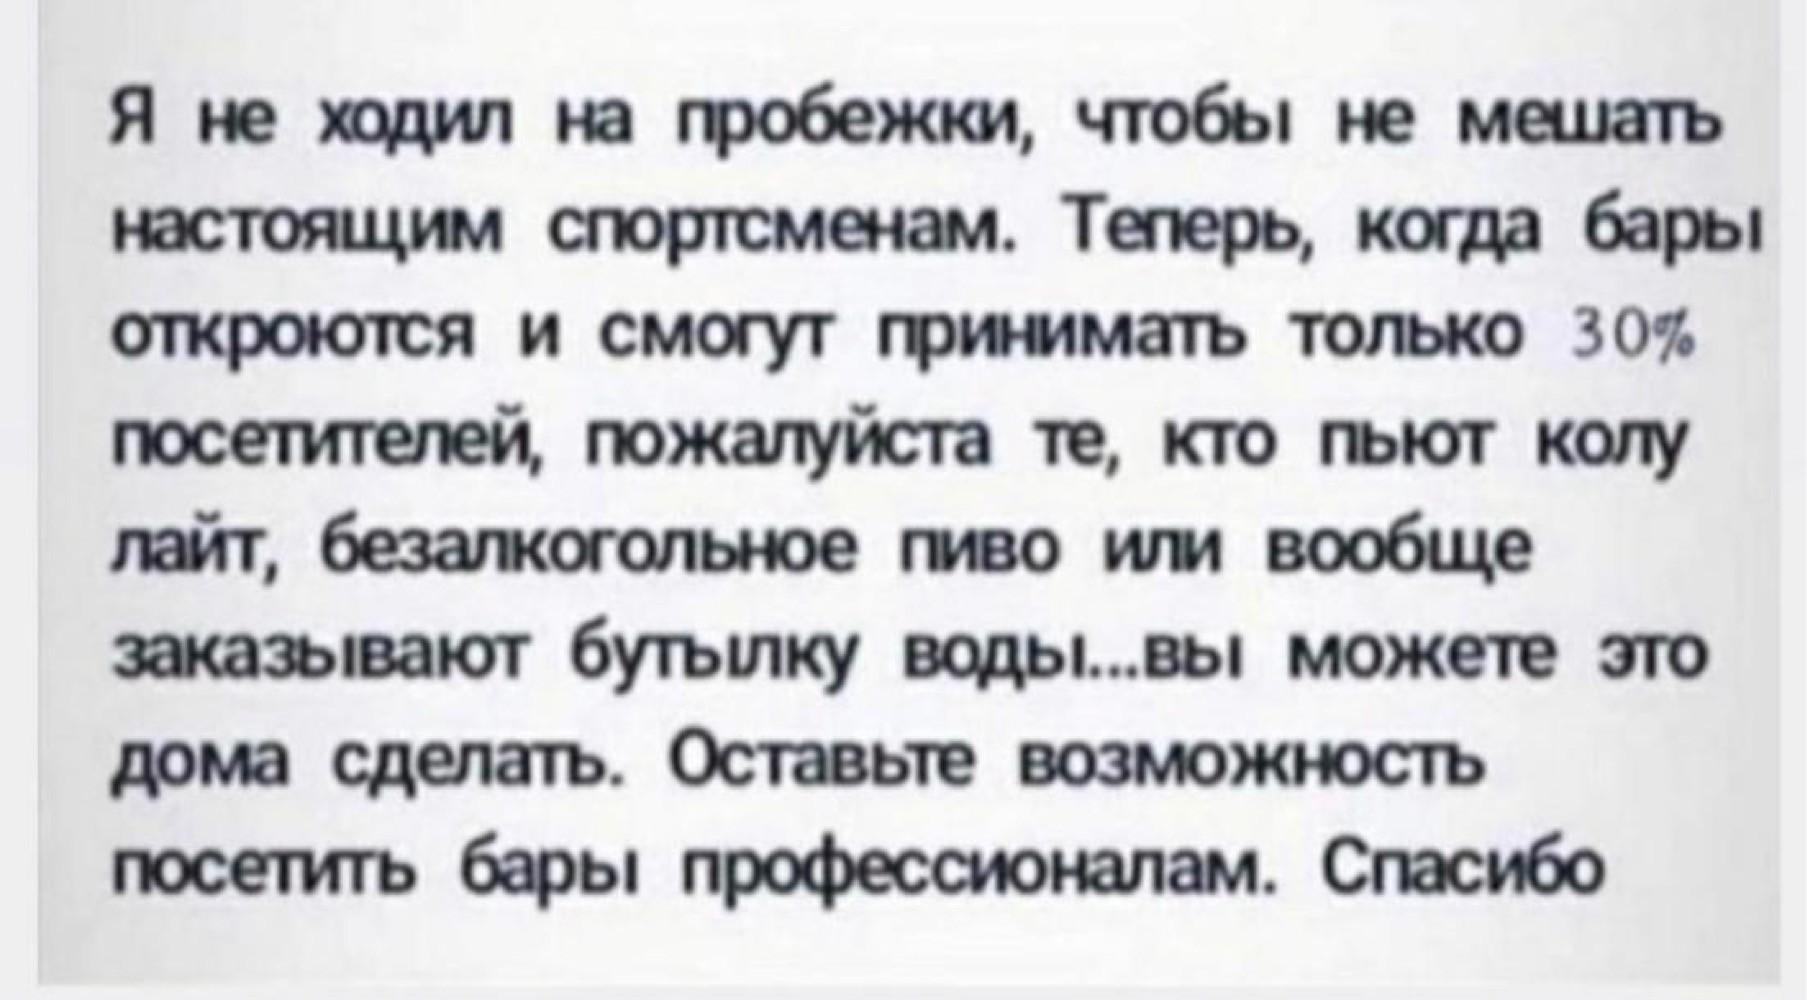 https://cs13.pikabu.ru/post_img/big/2020/05/14/8/15894593581826624.jpg